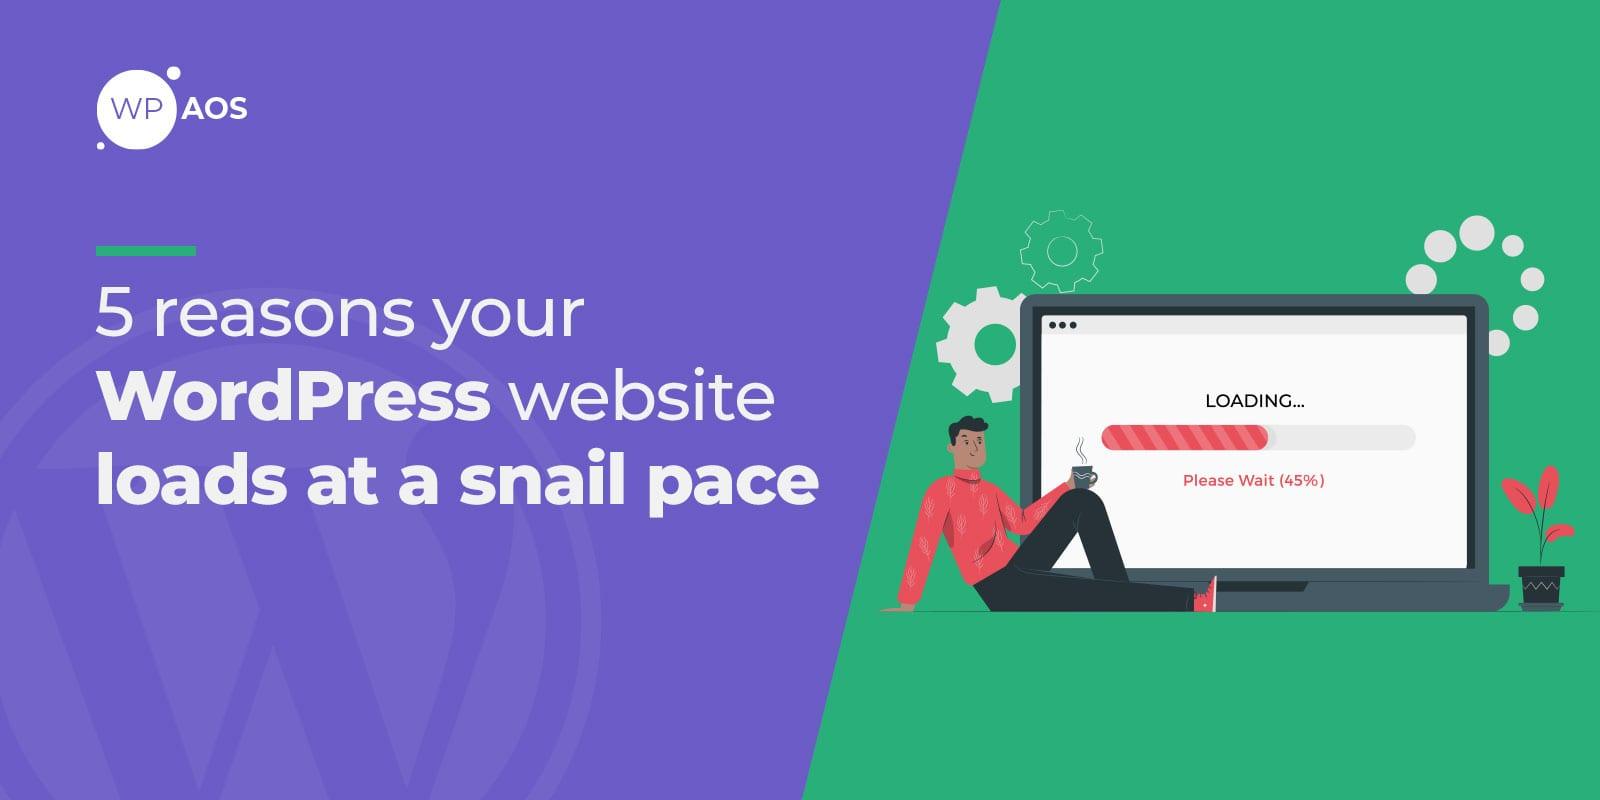 slow website, wordpress optimization, woocommerce maintenance, wpaos